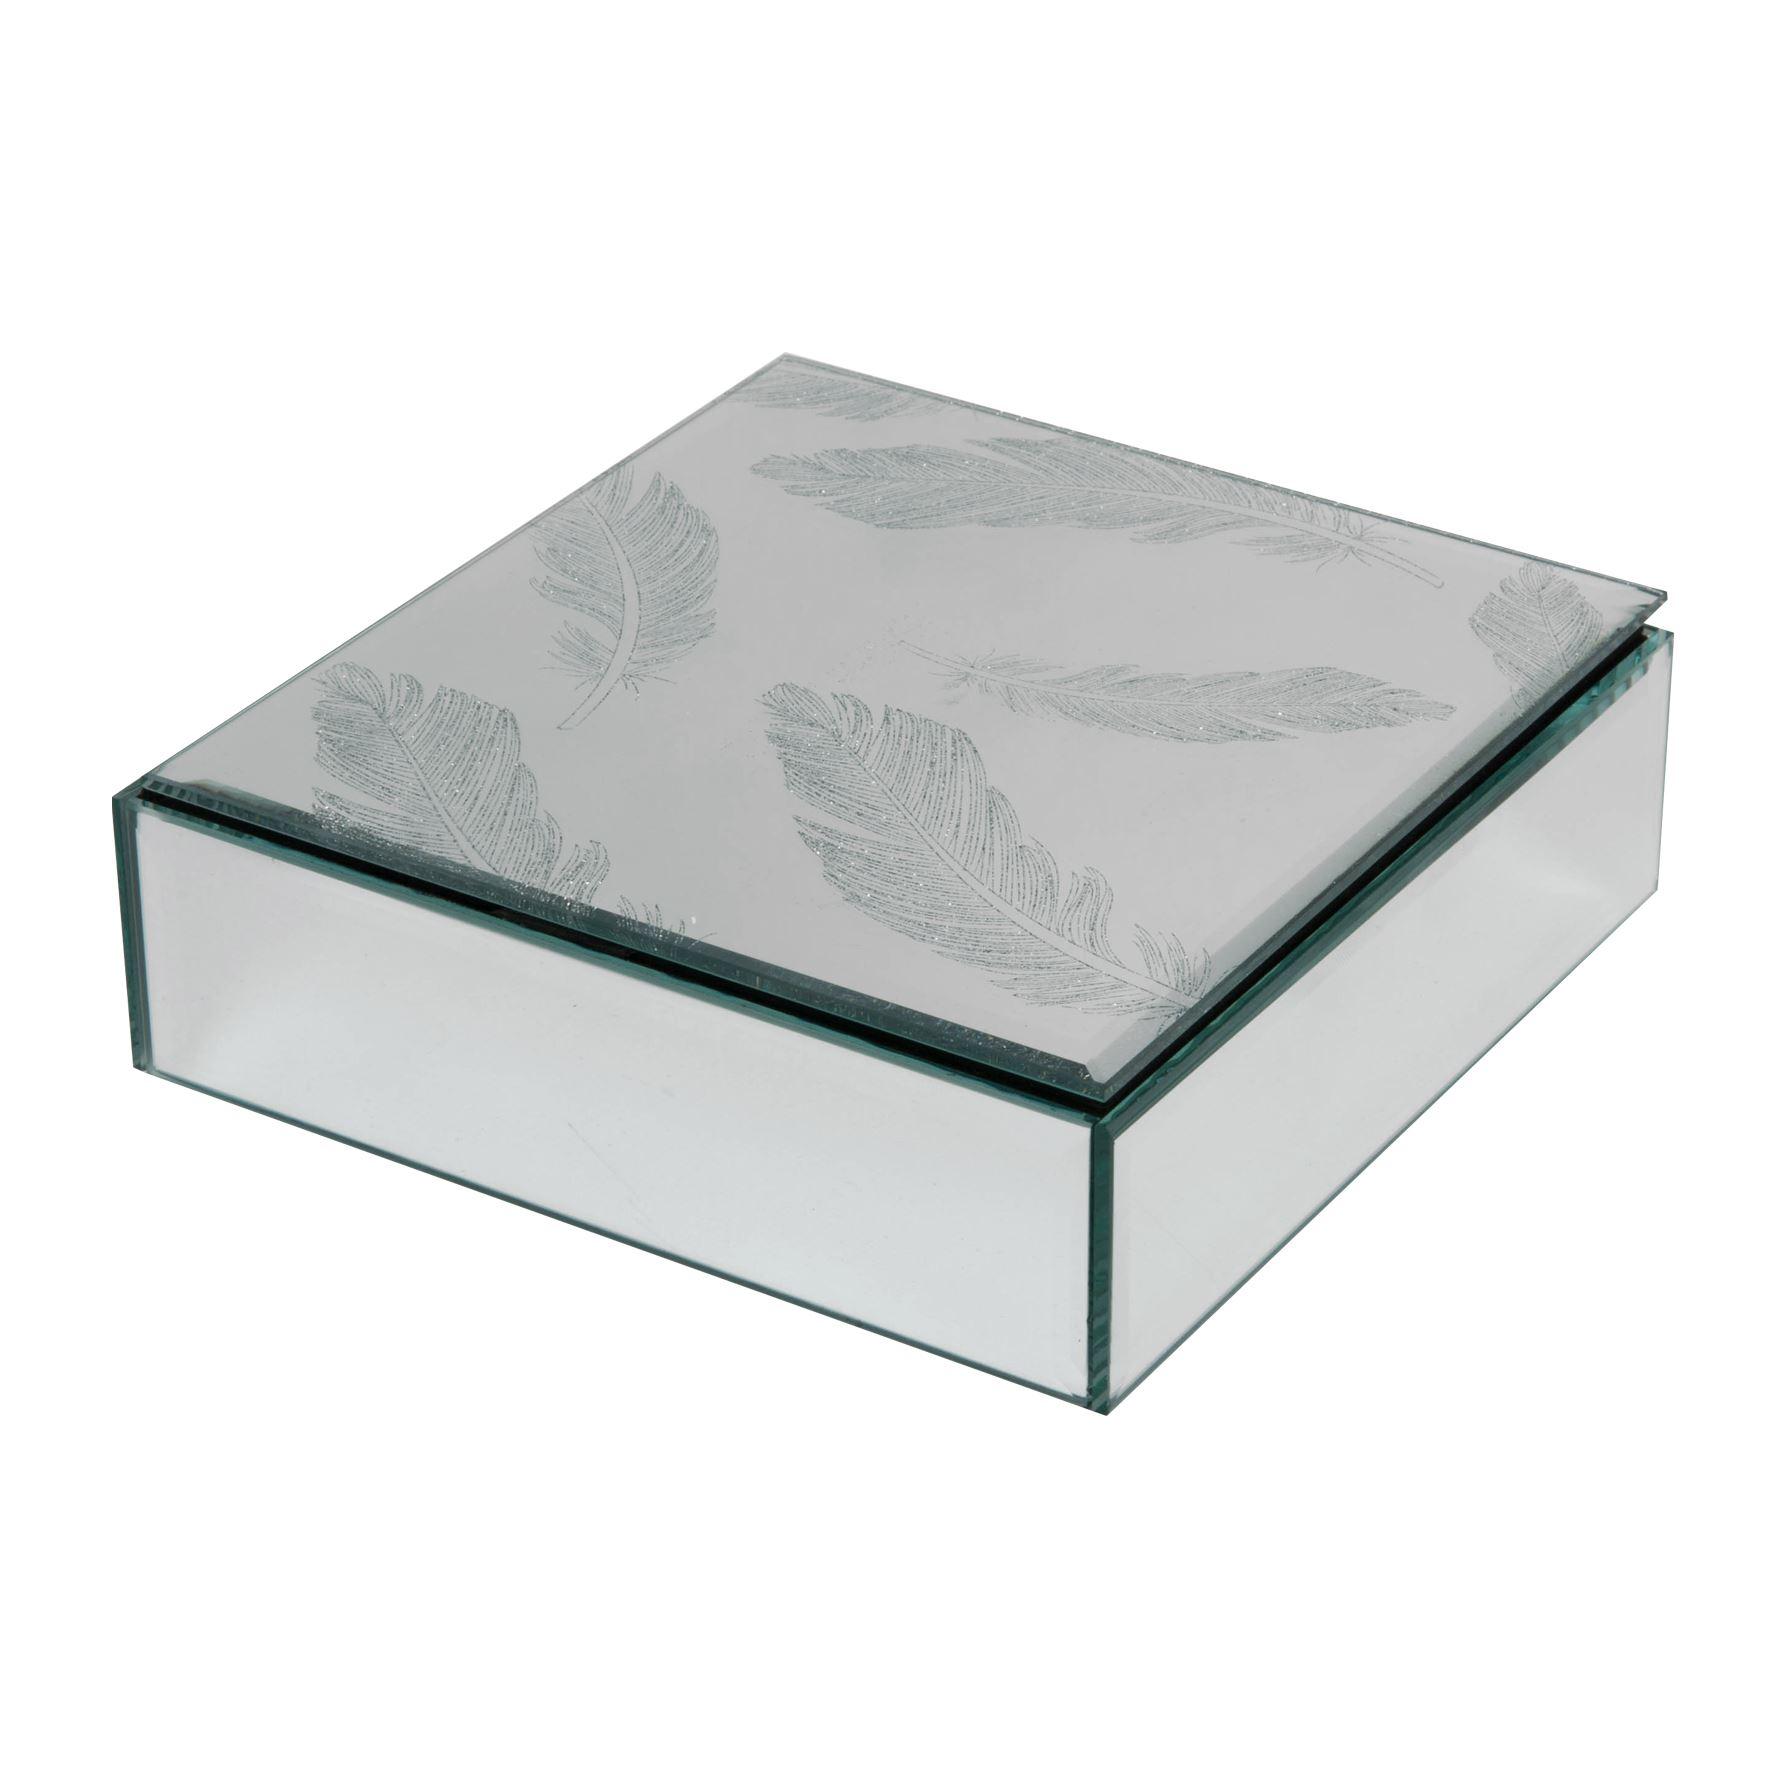 Hestia Silver Glitter Feather Glass Trinket Box